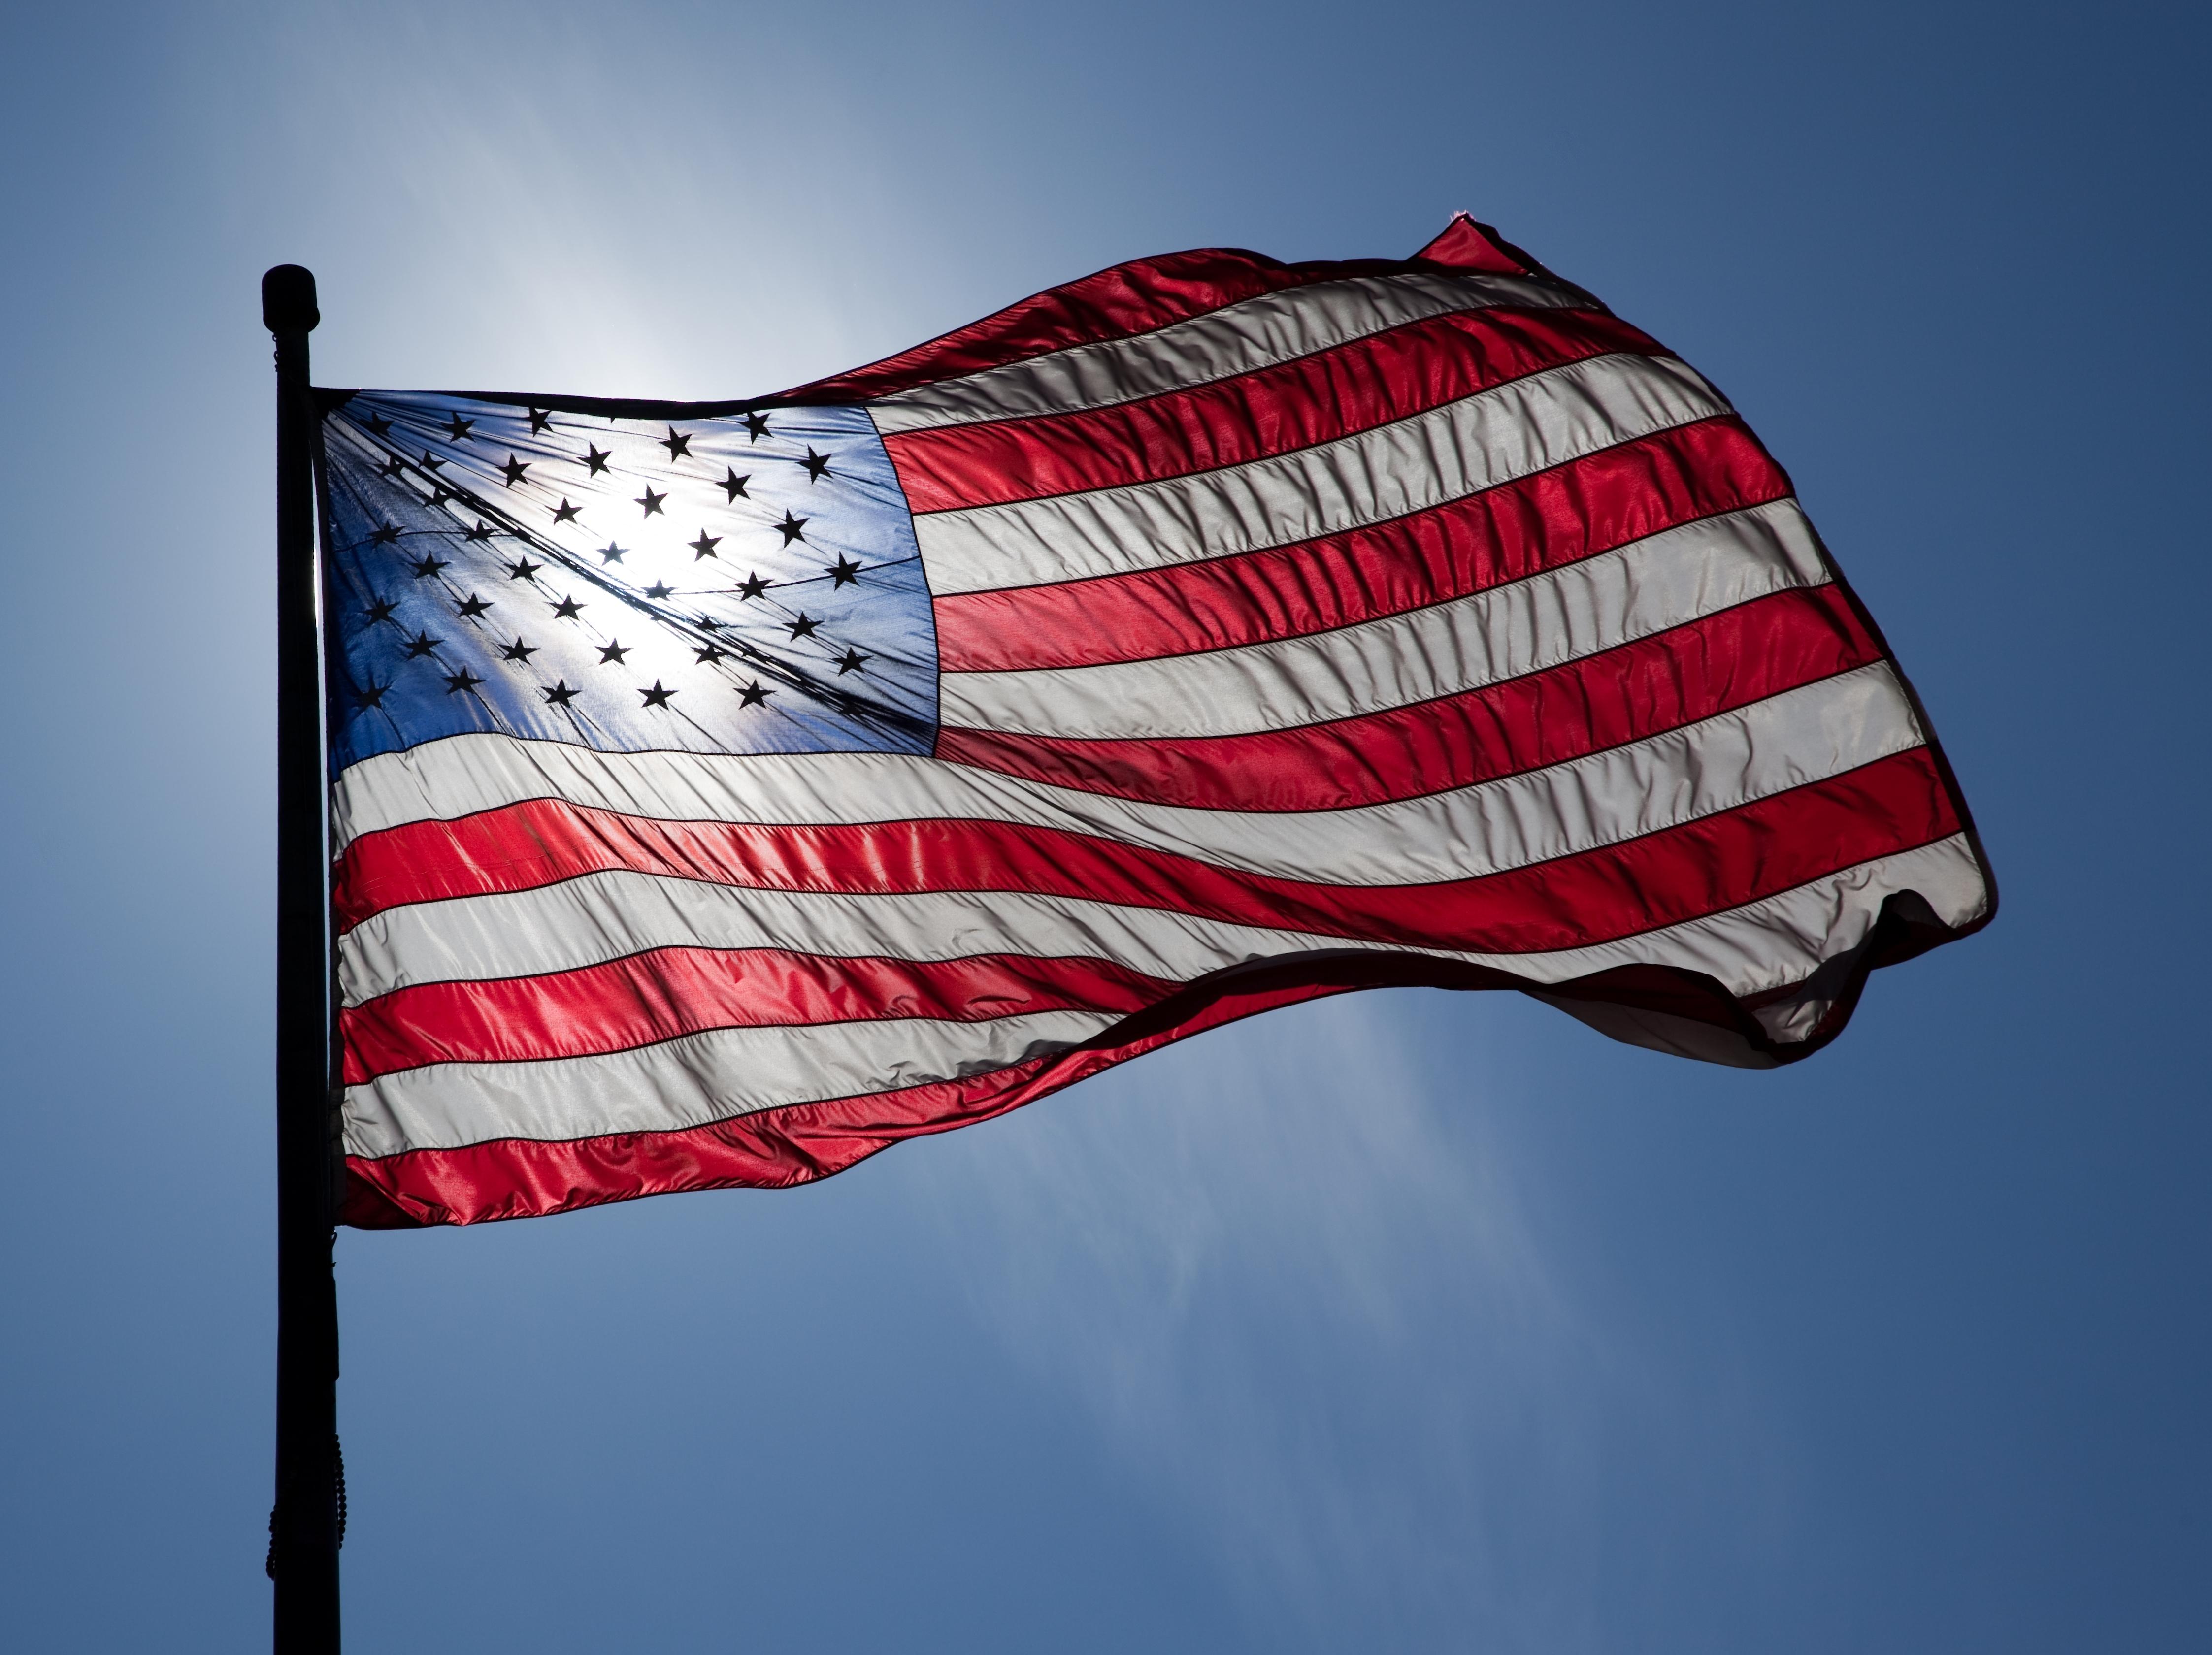 2048x1152 american flag 2048x1152 resolution hd 4k wallpapers